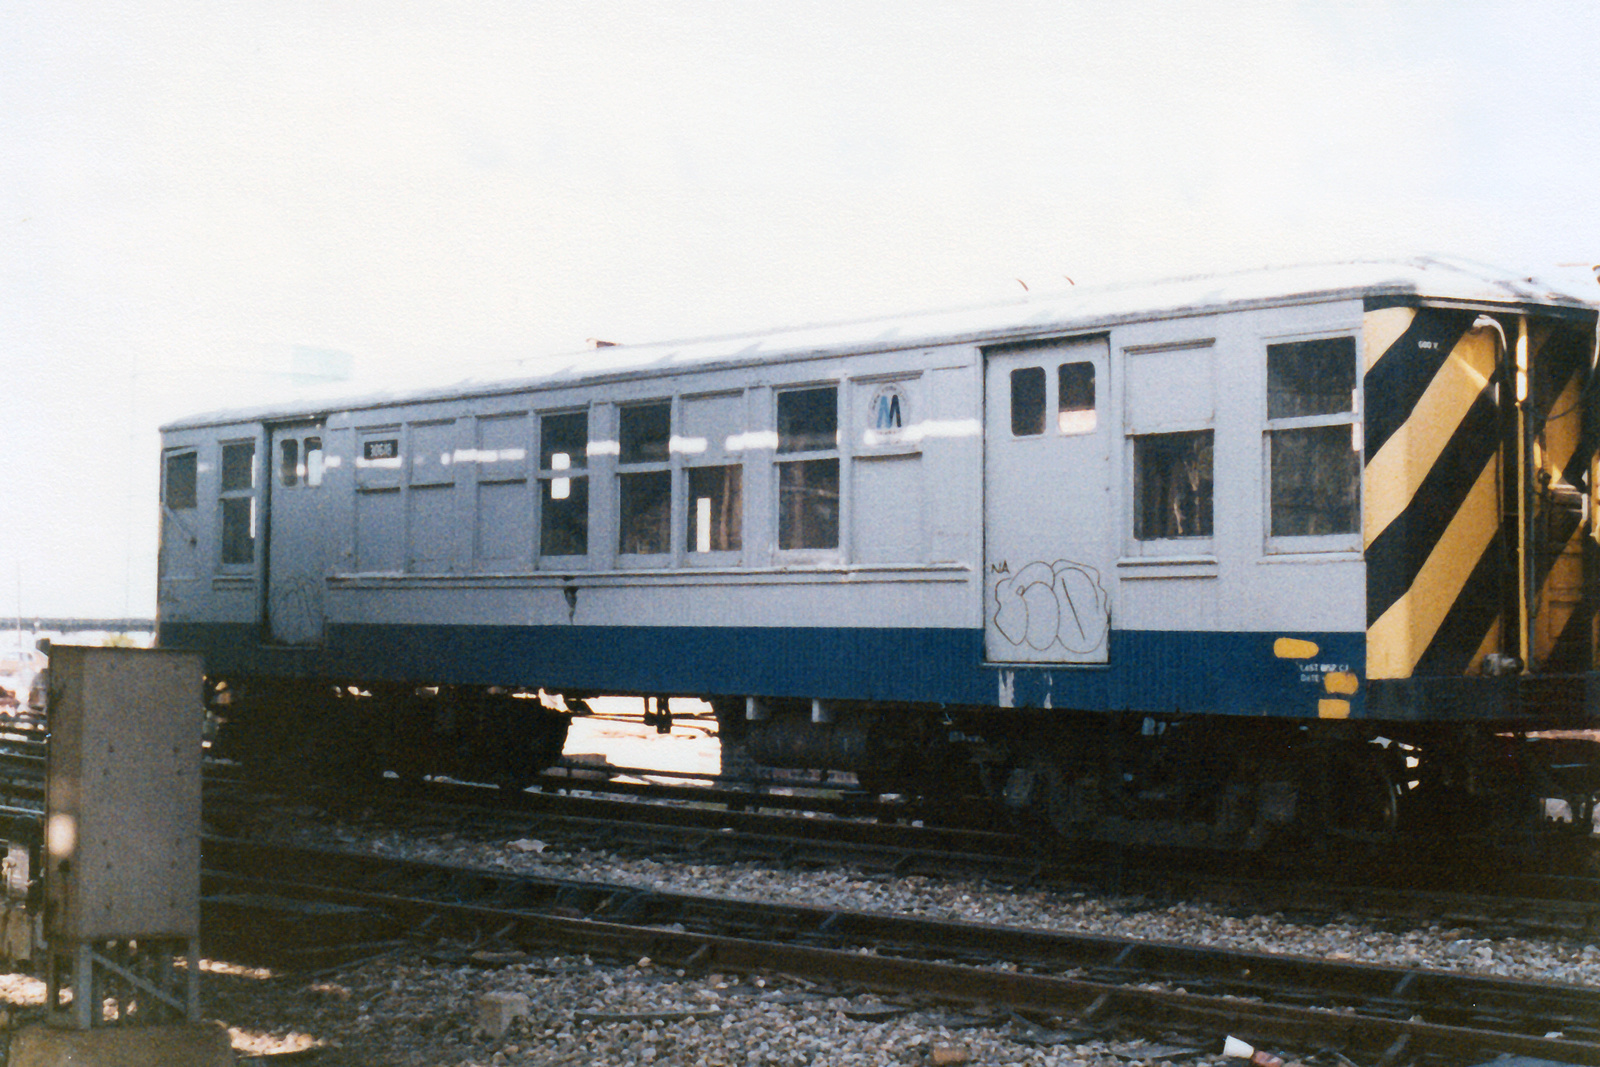 (775k, 1600x1067)<br><b>Country:</b> United States<br><b>City:</b> New York<br><b>System:</b> New York City Transit<br><b>Location:</b> Coney Island Yard<br><b>Car:</b> BMT Q 30618 (ex-1631)<br><b>Collection of:</b> Nicholas Fabrizio<br><b>Notes:</b> Pump train - reach car.<br><b>Viewed (this week/total):</b> 11 / 86